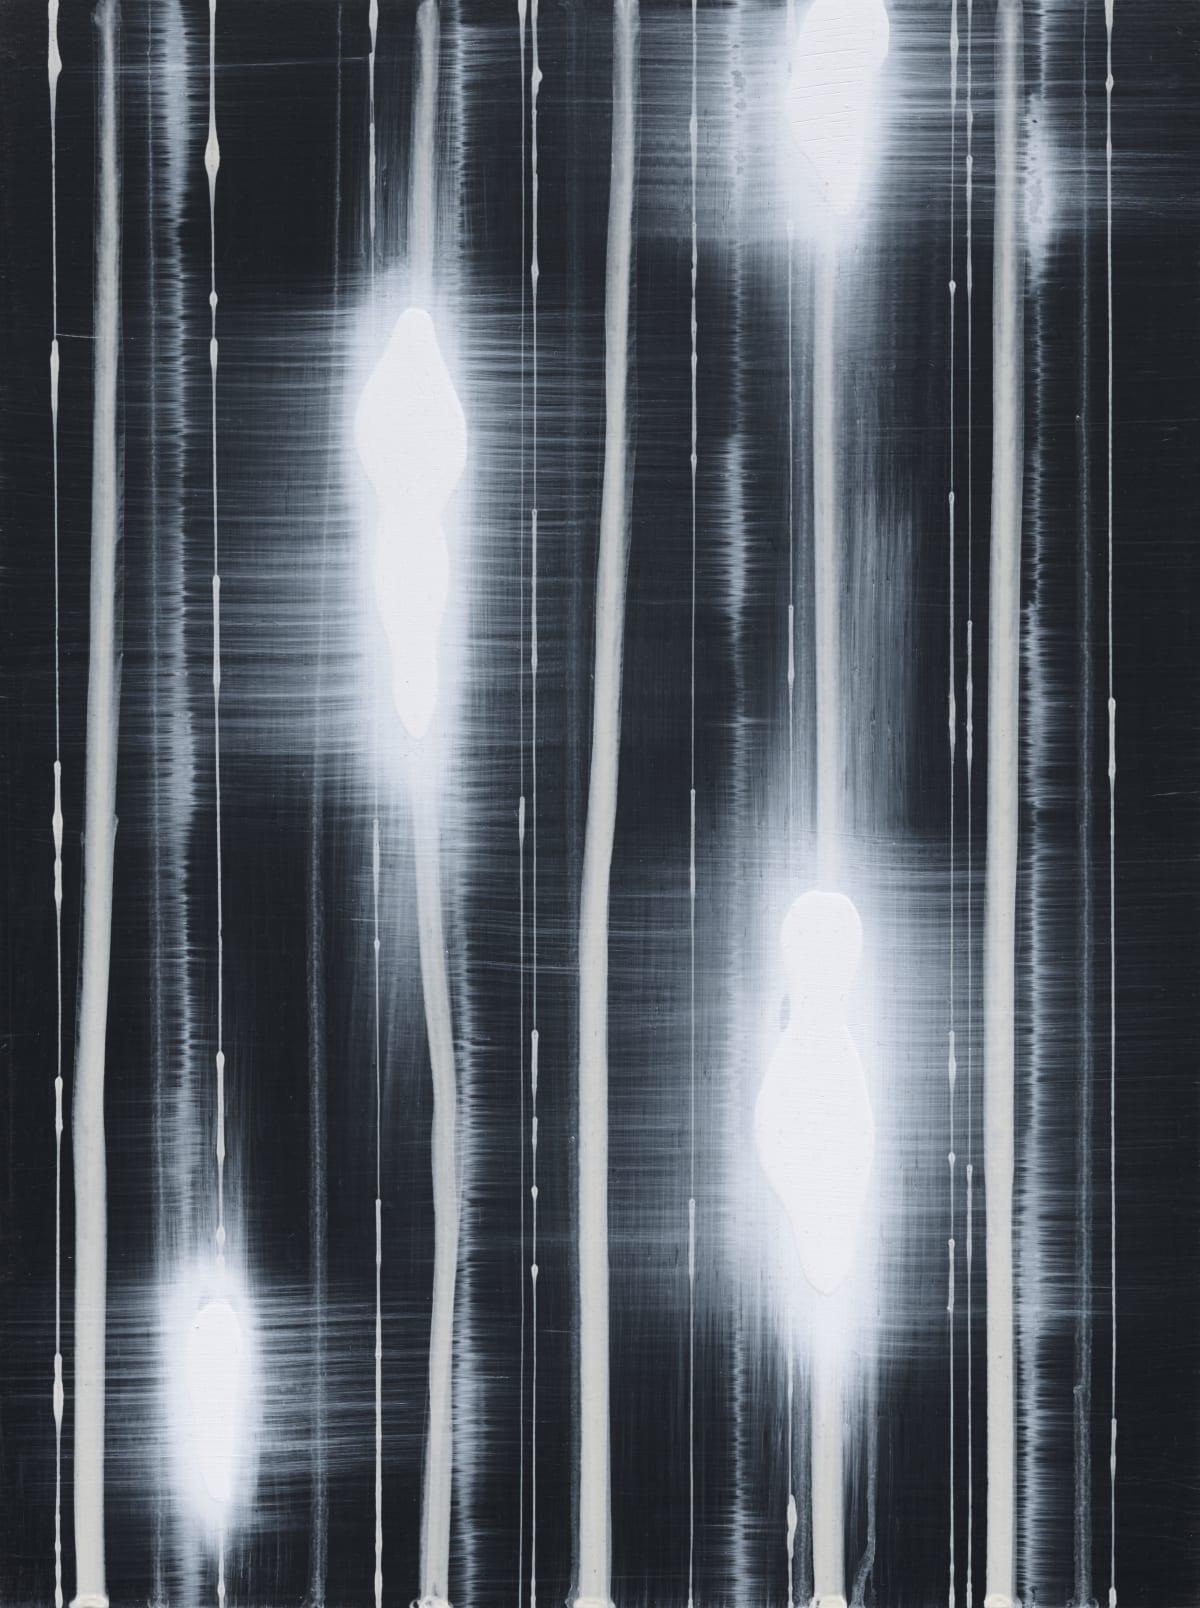 Mark Francis, White Light (Fission), 2019